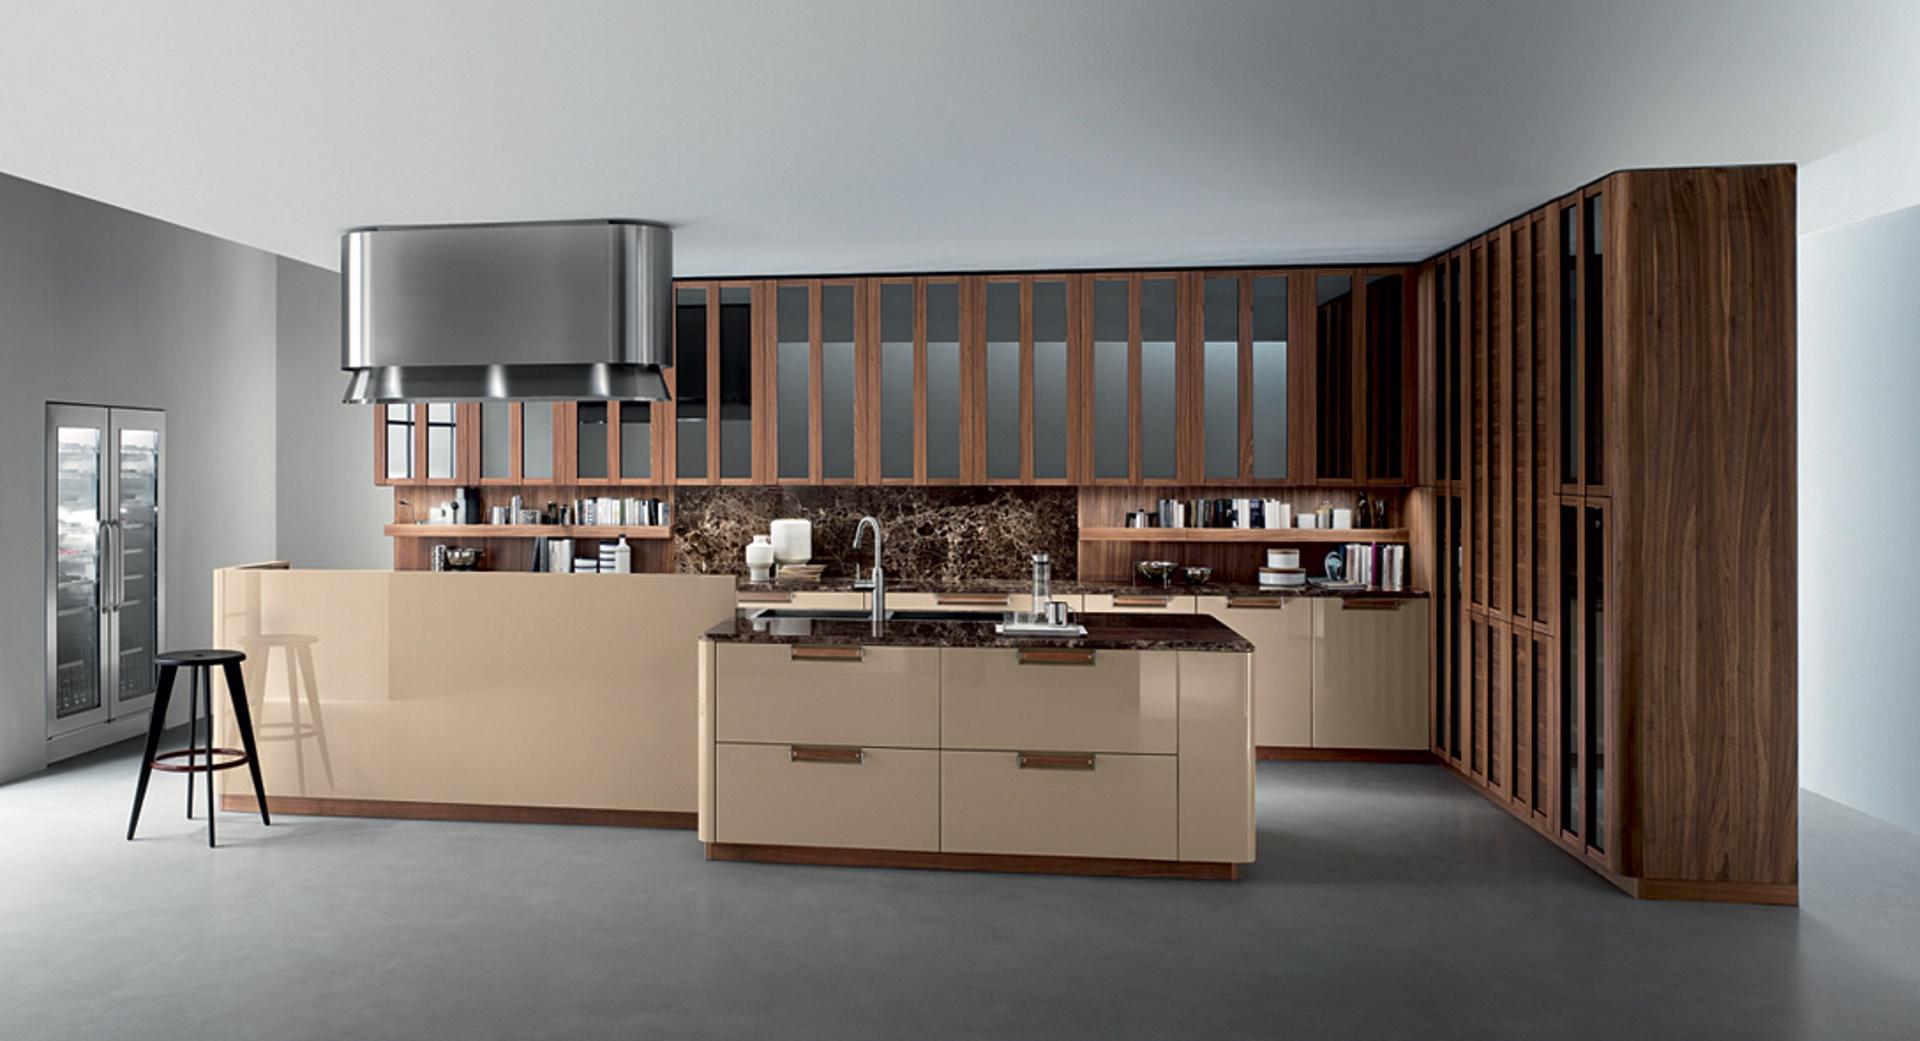 Cucine Di Lusso Design : Noisette cucina moderna solida di lusso cucine composit